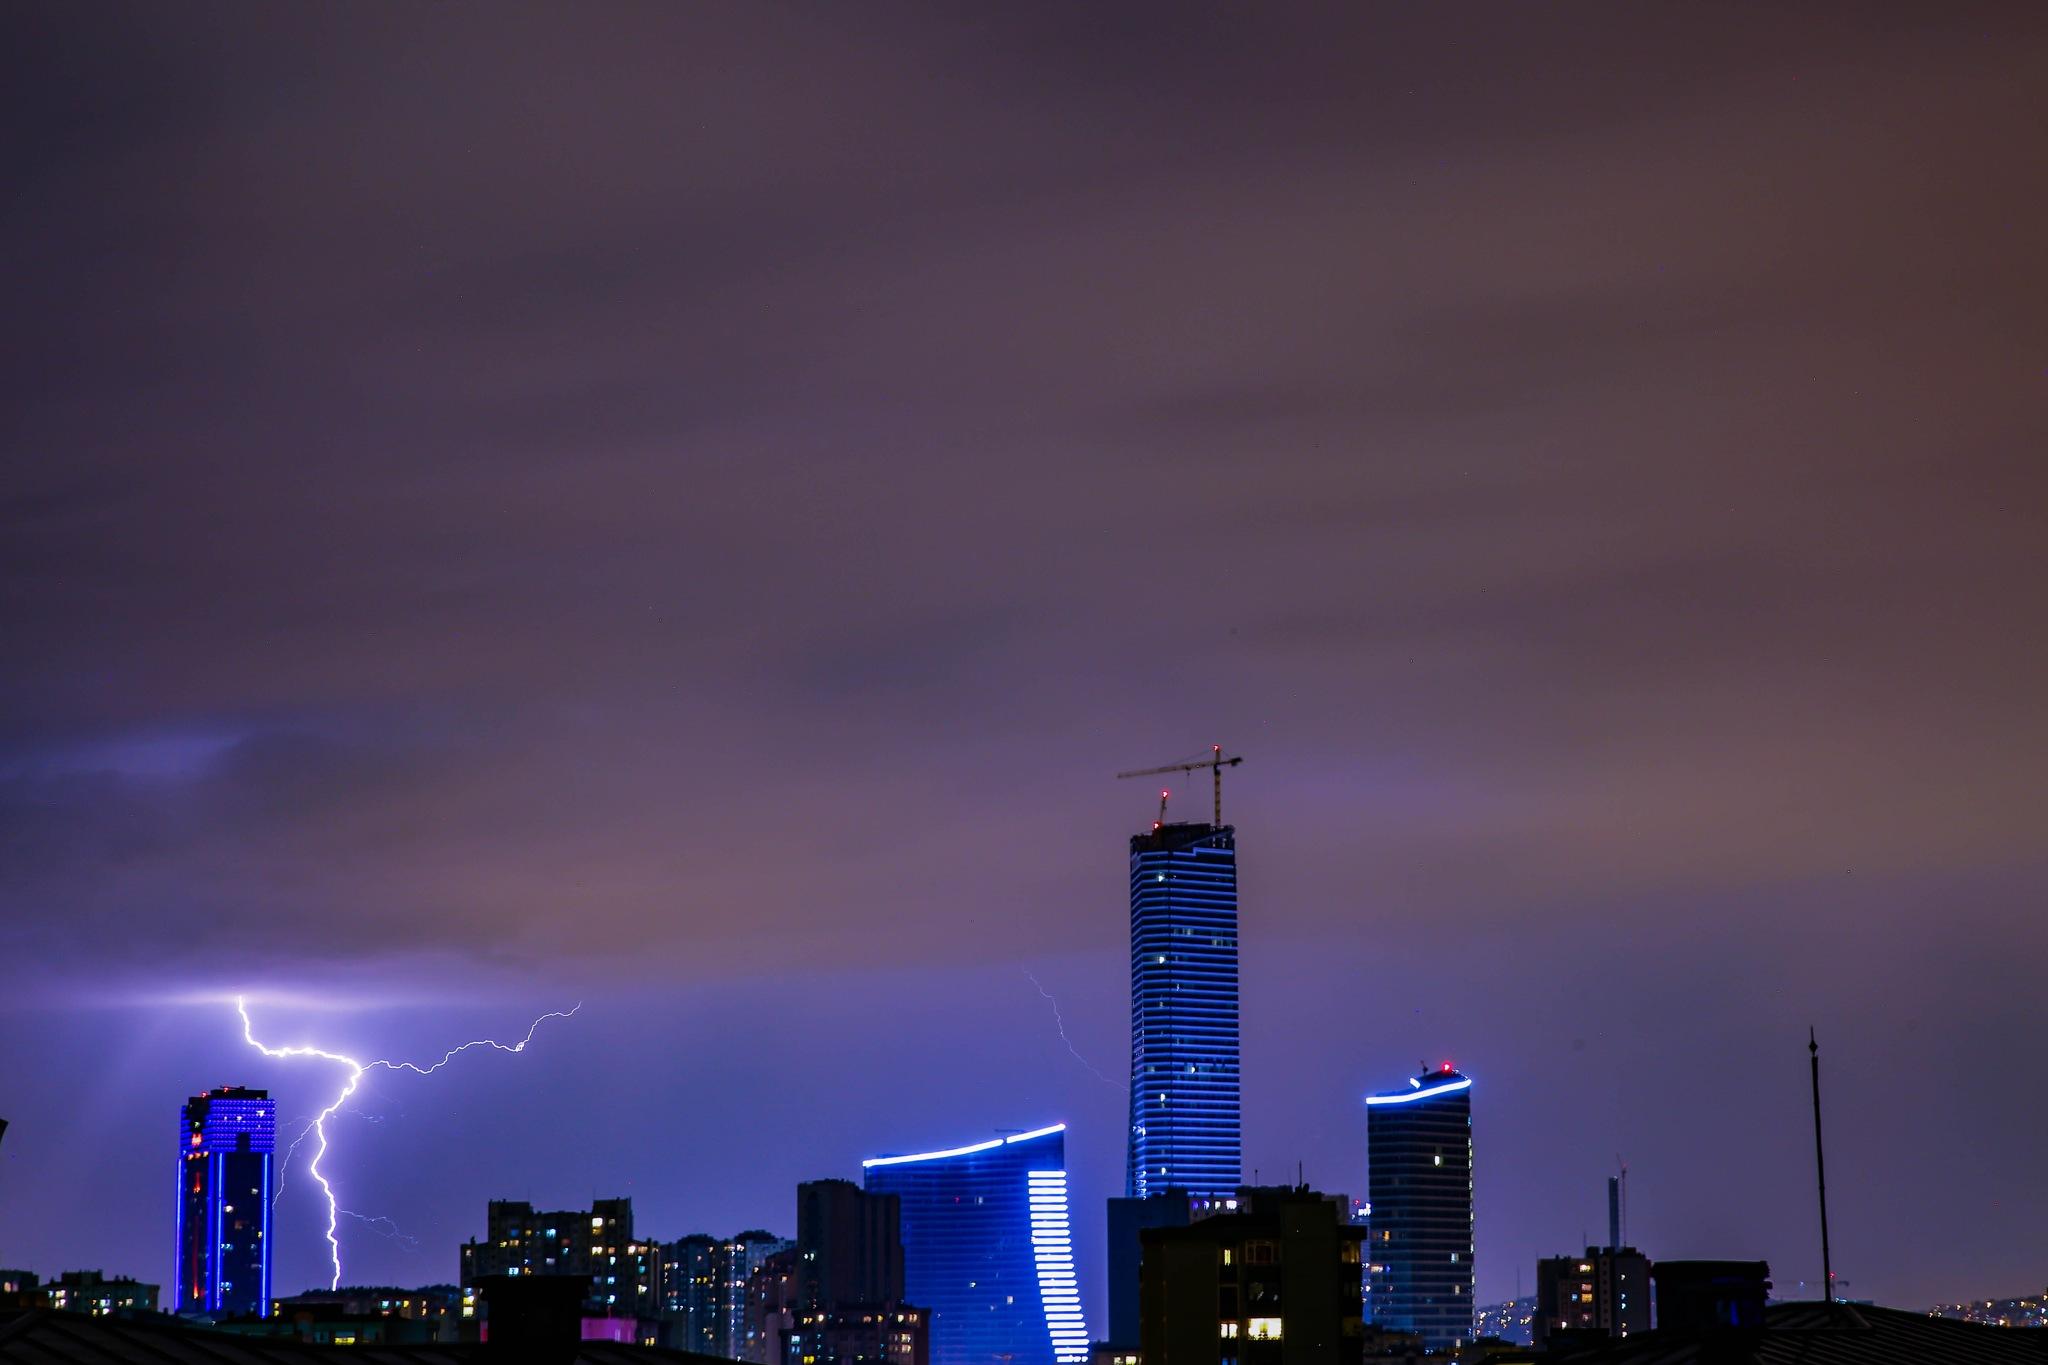 Lightning in Istanbul by hbilgen